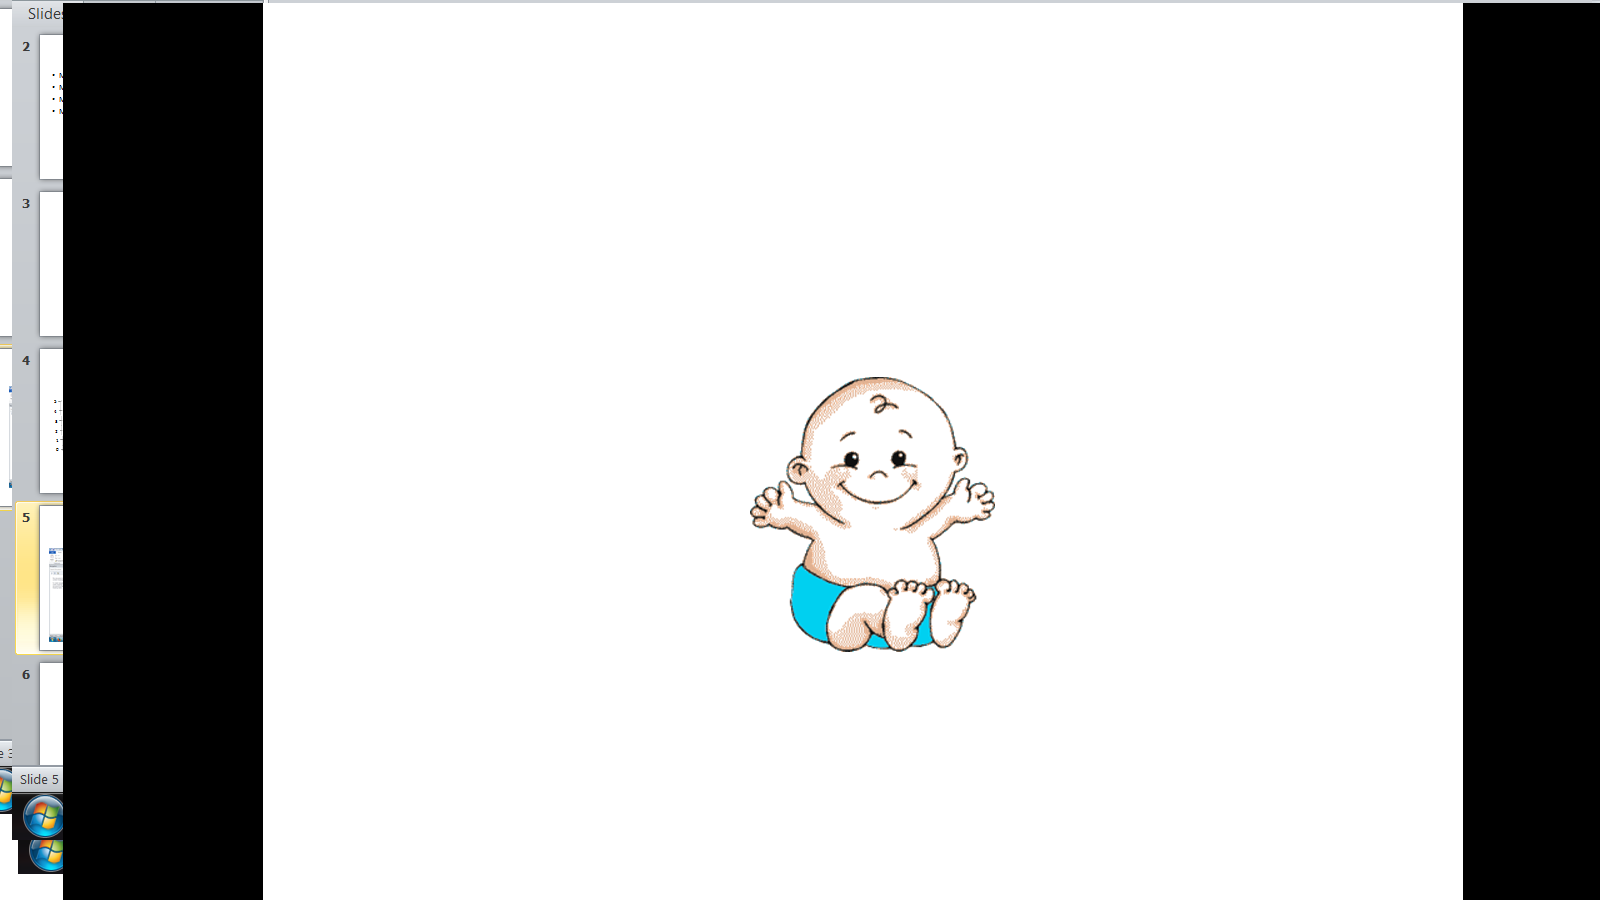 harga hp samsung 2016 animasi bergerak untuk powerpoint